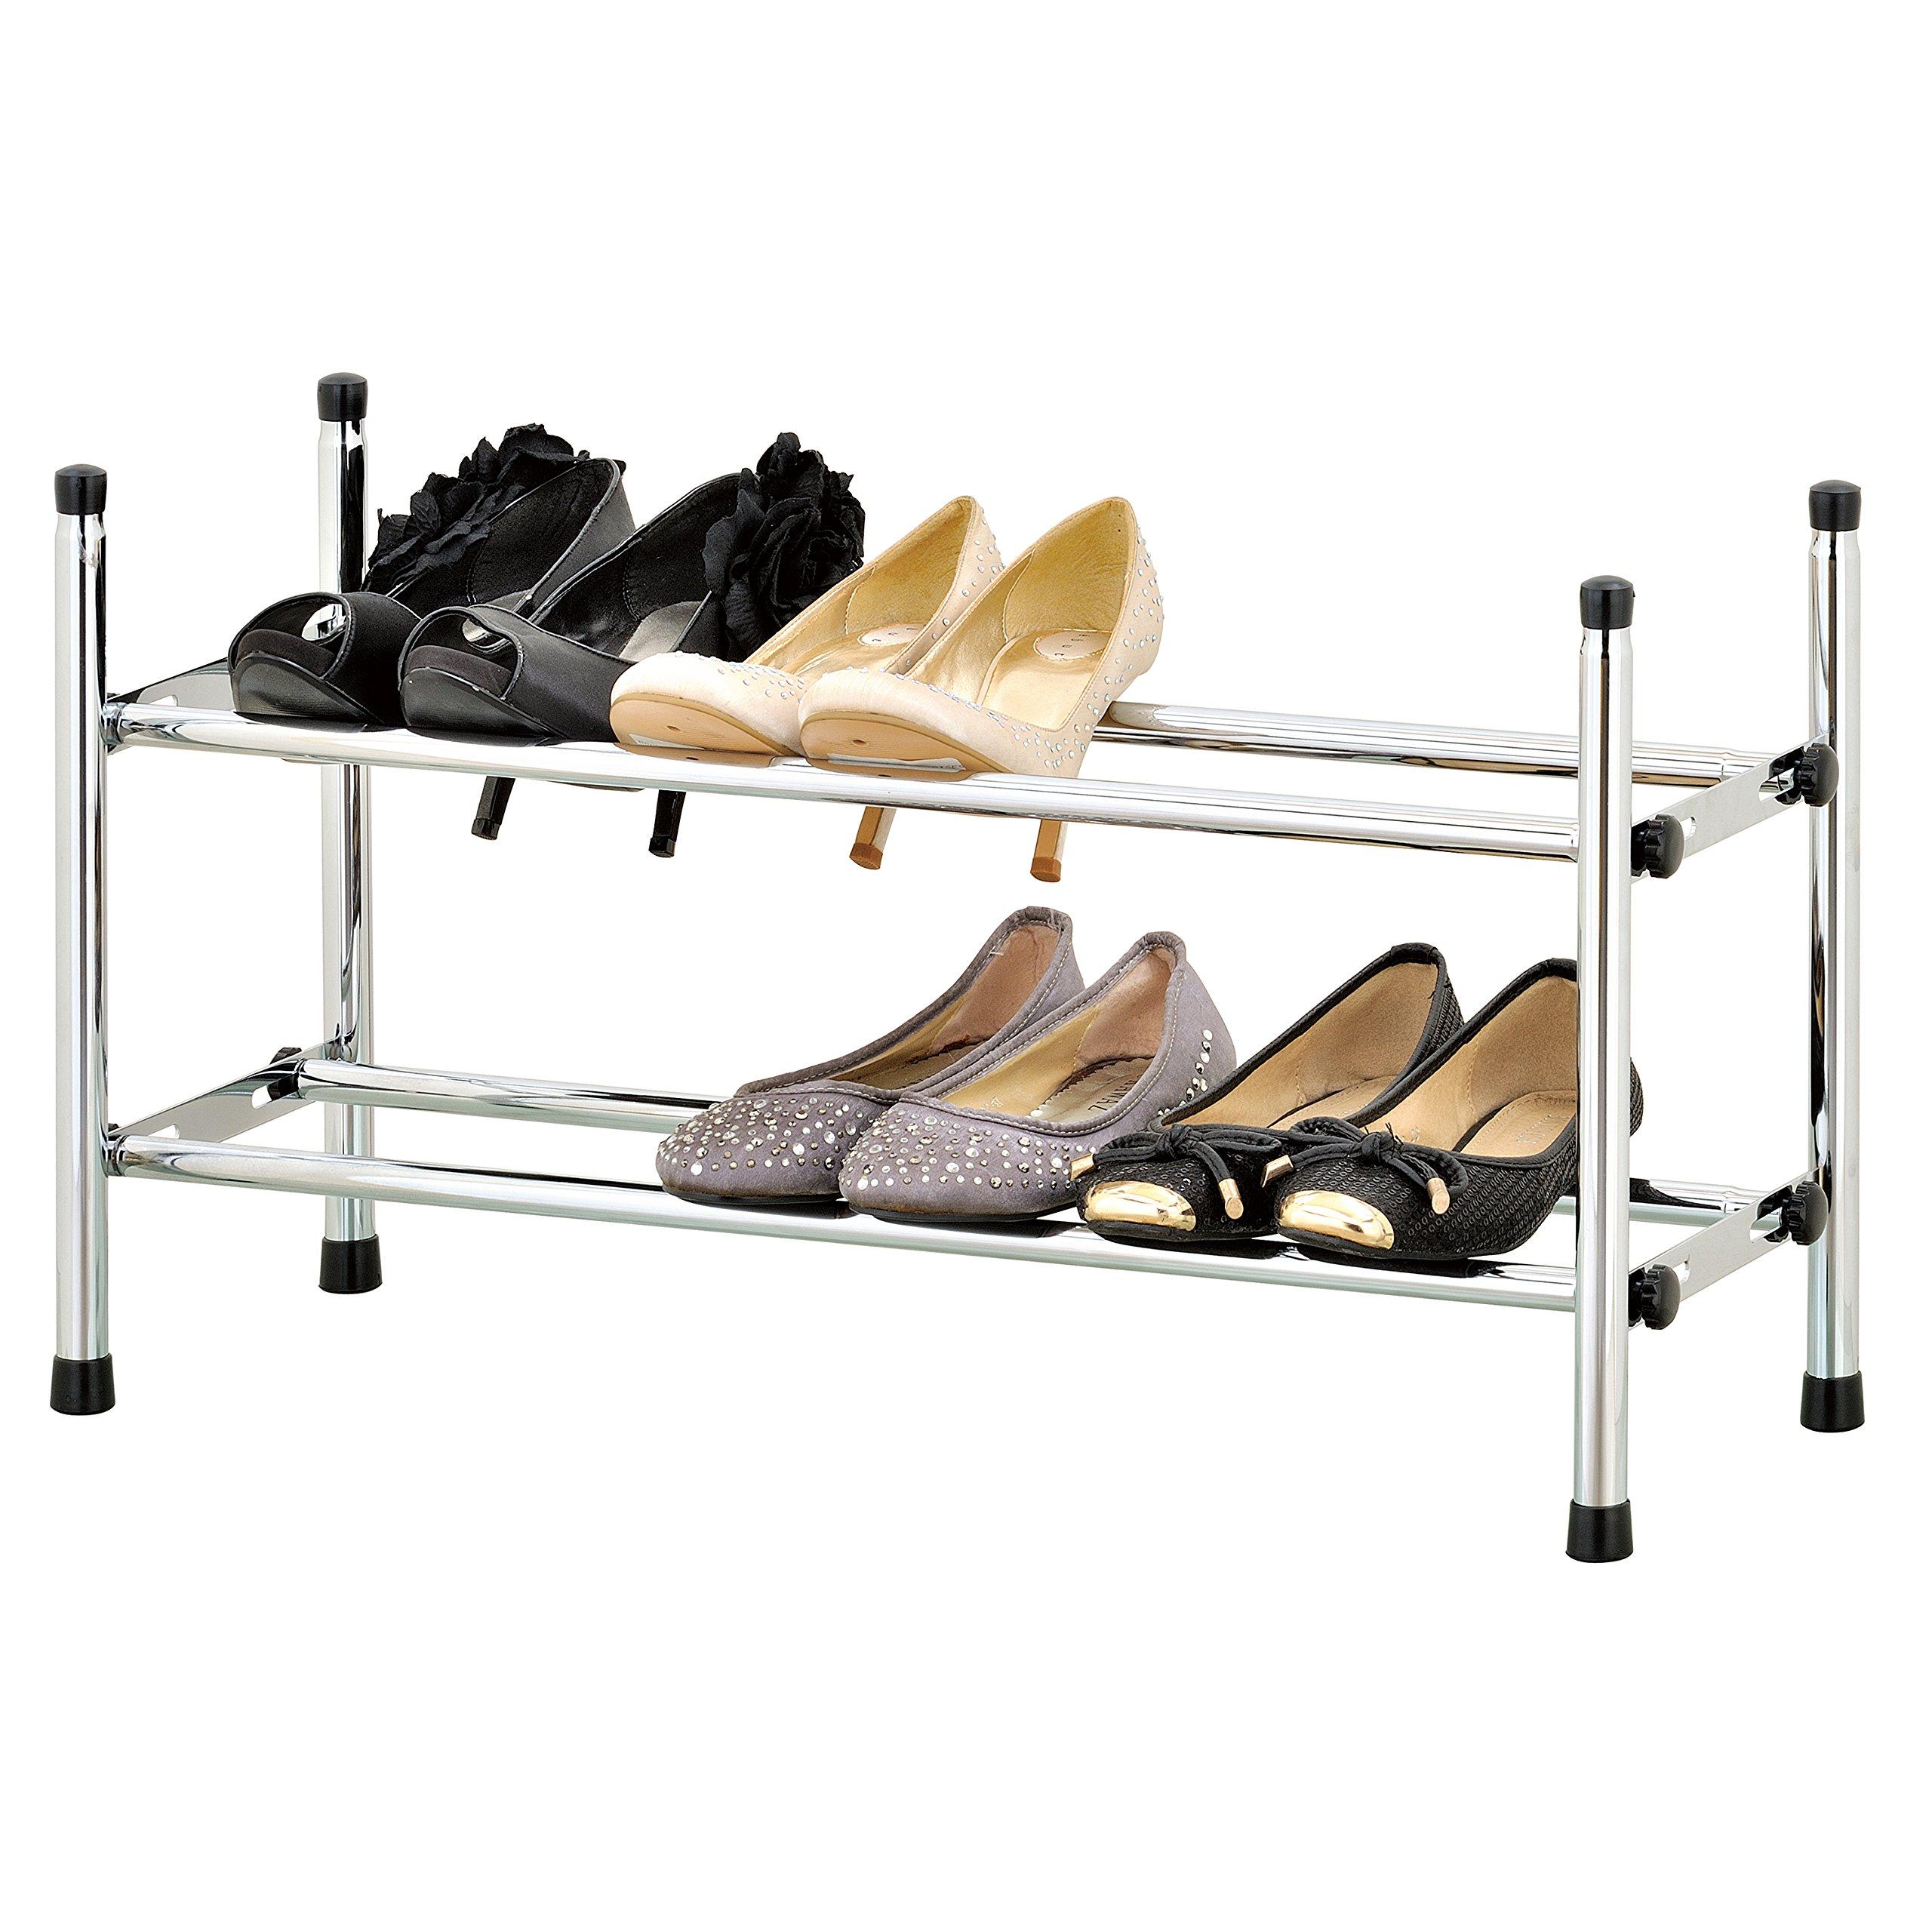 2-10 Tier Metal Shoes Rack Stand Storage Organizer Shelf Holder Stackable  US